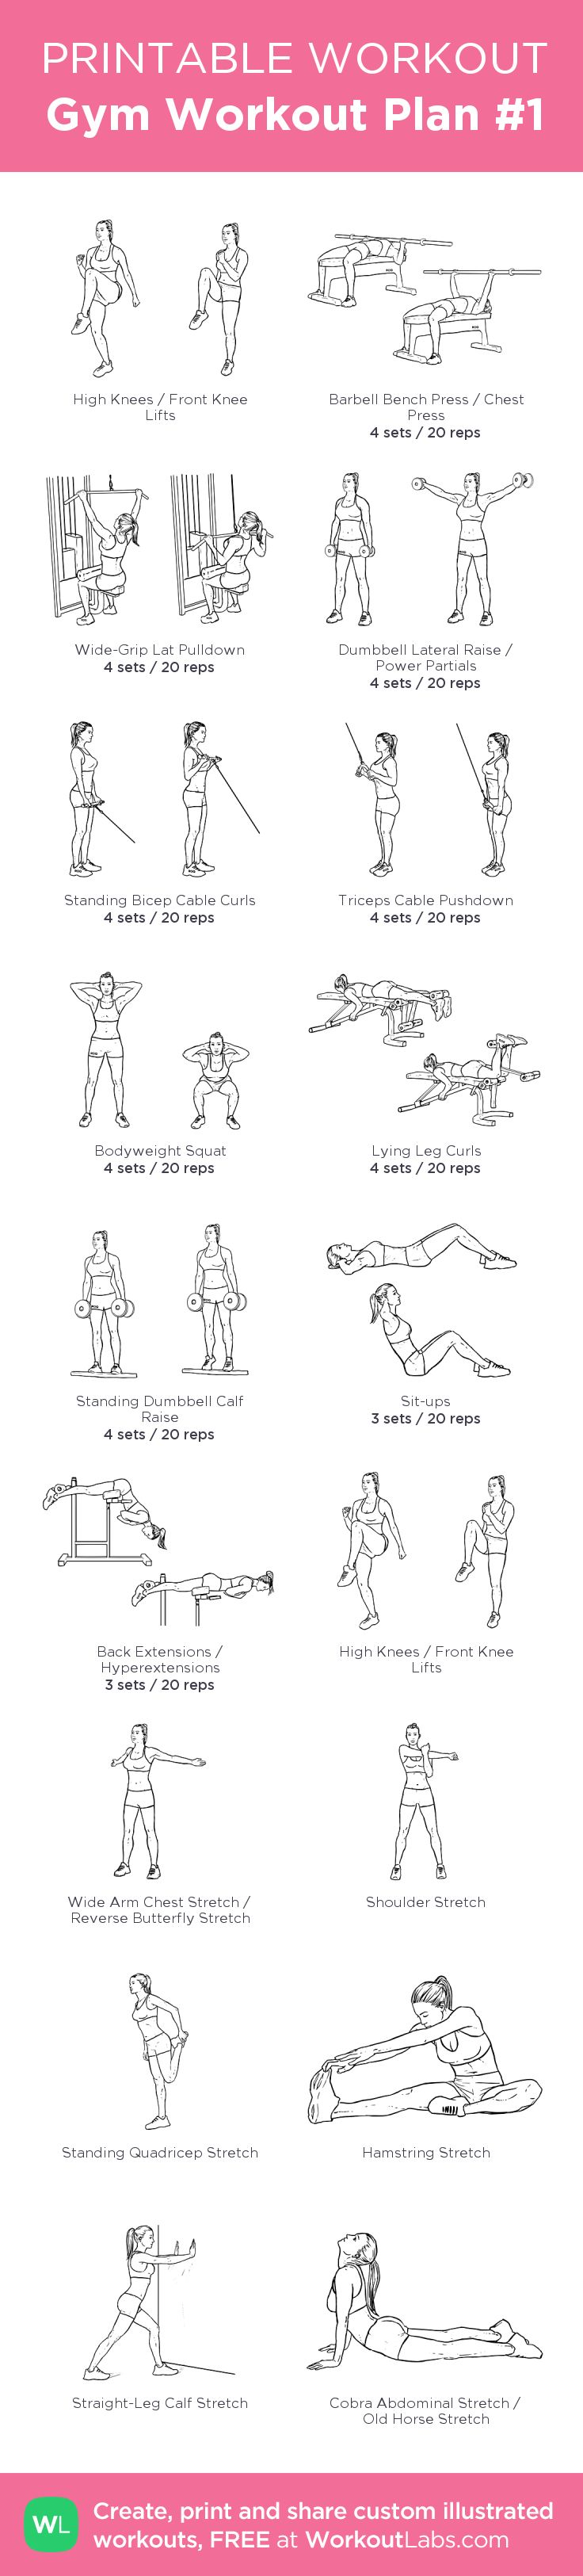 Gym Workout Plan #1 –my custom workout created at WorkoutLabs.com • Click through to download as printable PDF! #customworkout